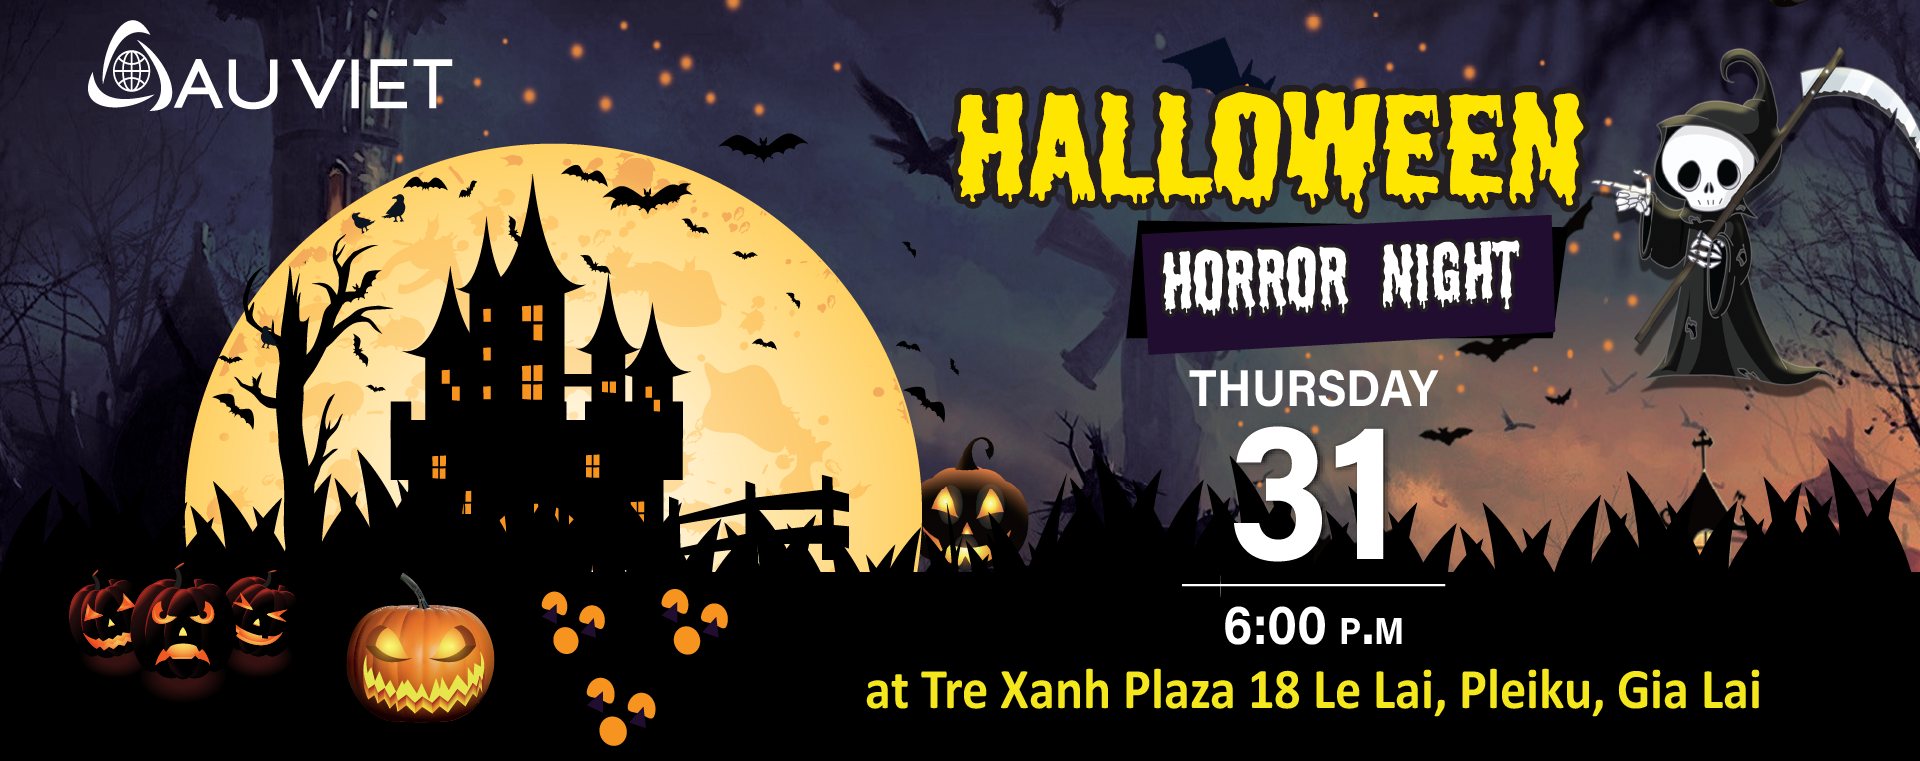 Halloween horror night 2019 tại Tre Xanh Plaza – 31-10-2019